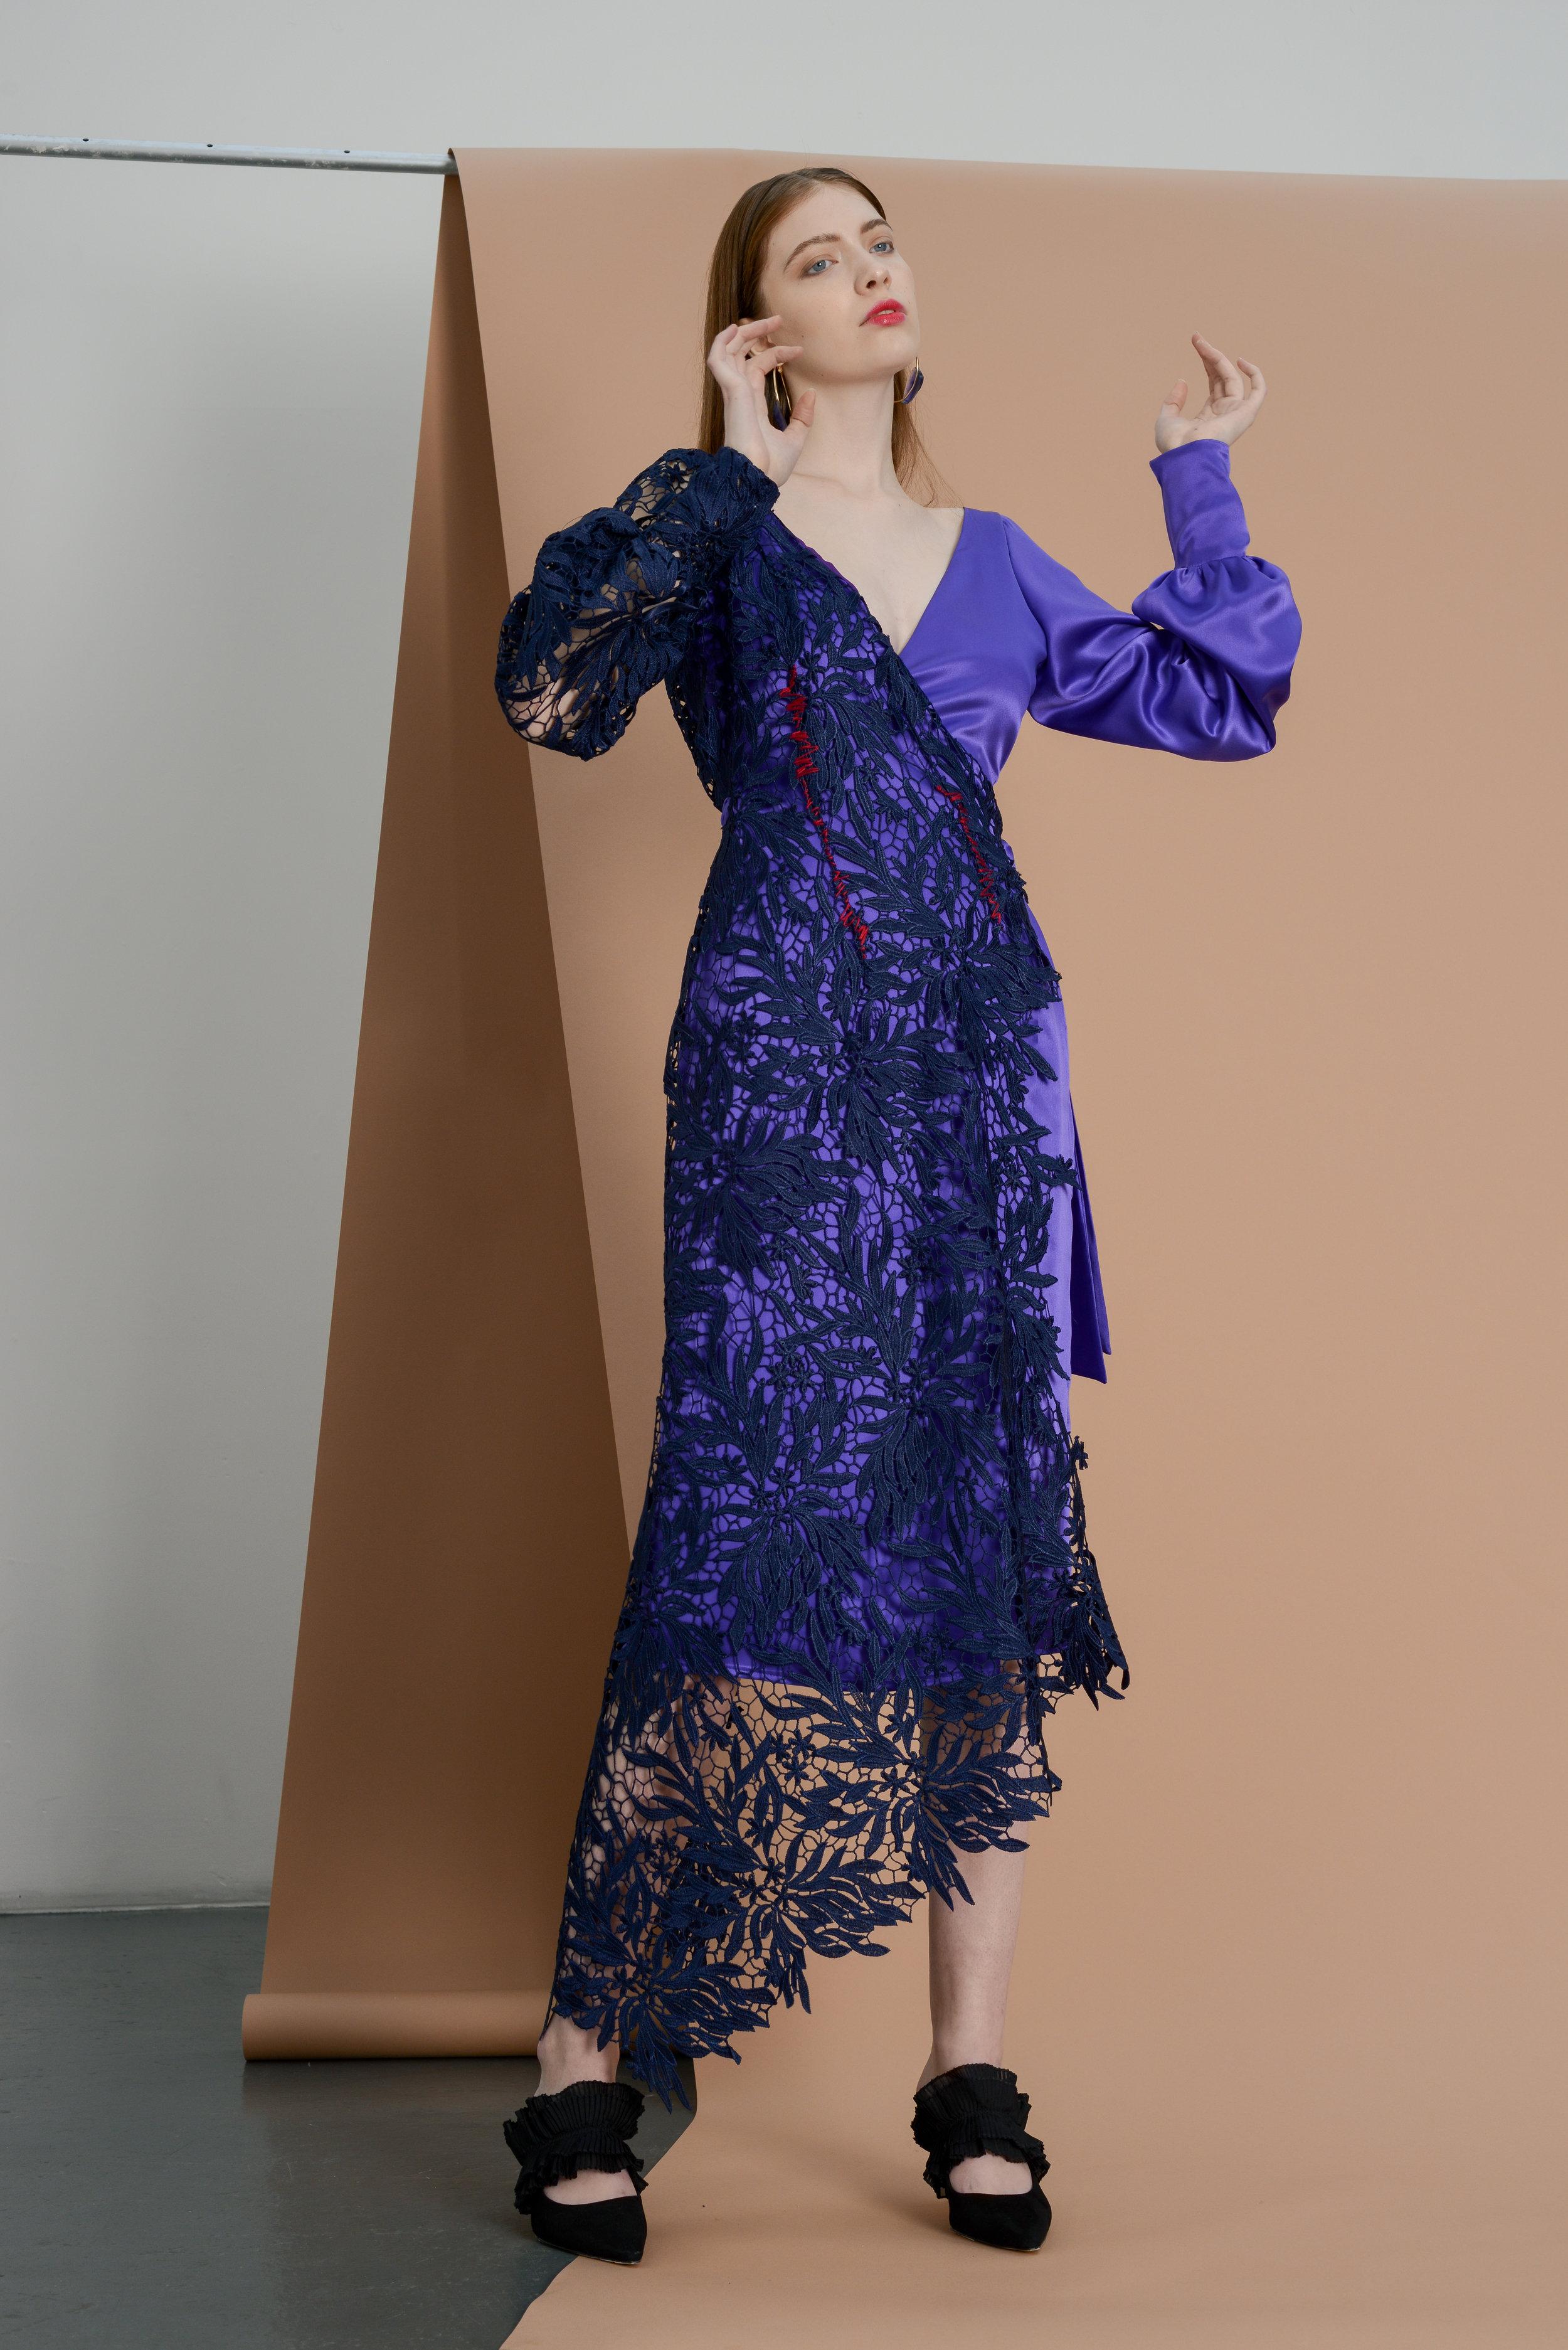 Drust Wrap Dress - Violet satin /Cearca Earrings - Gold tone